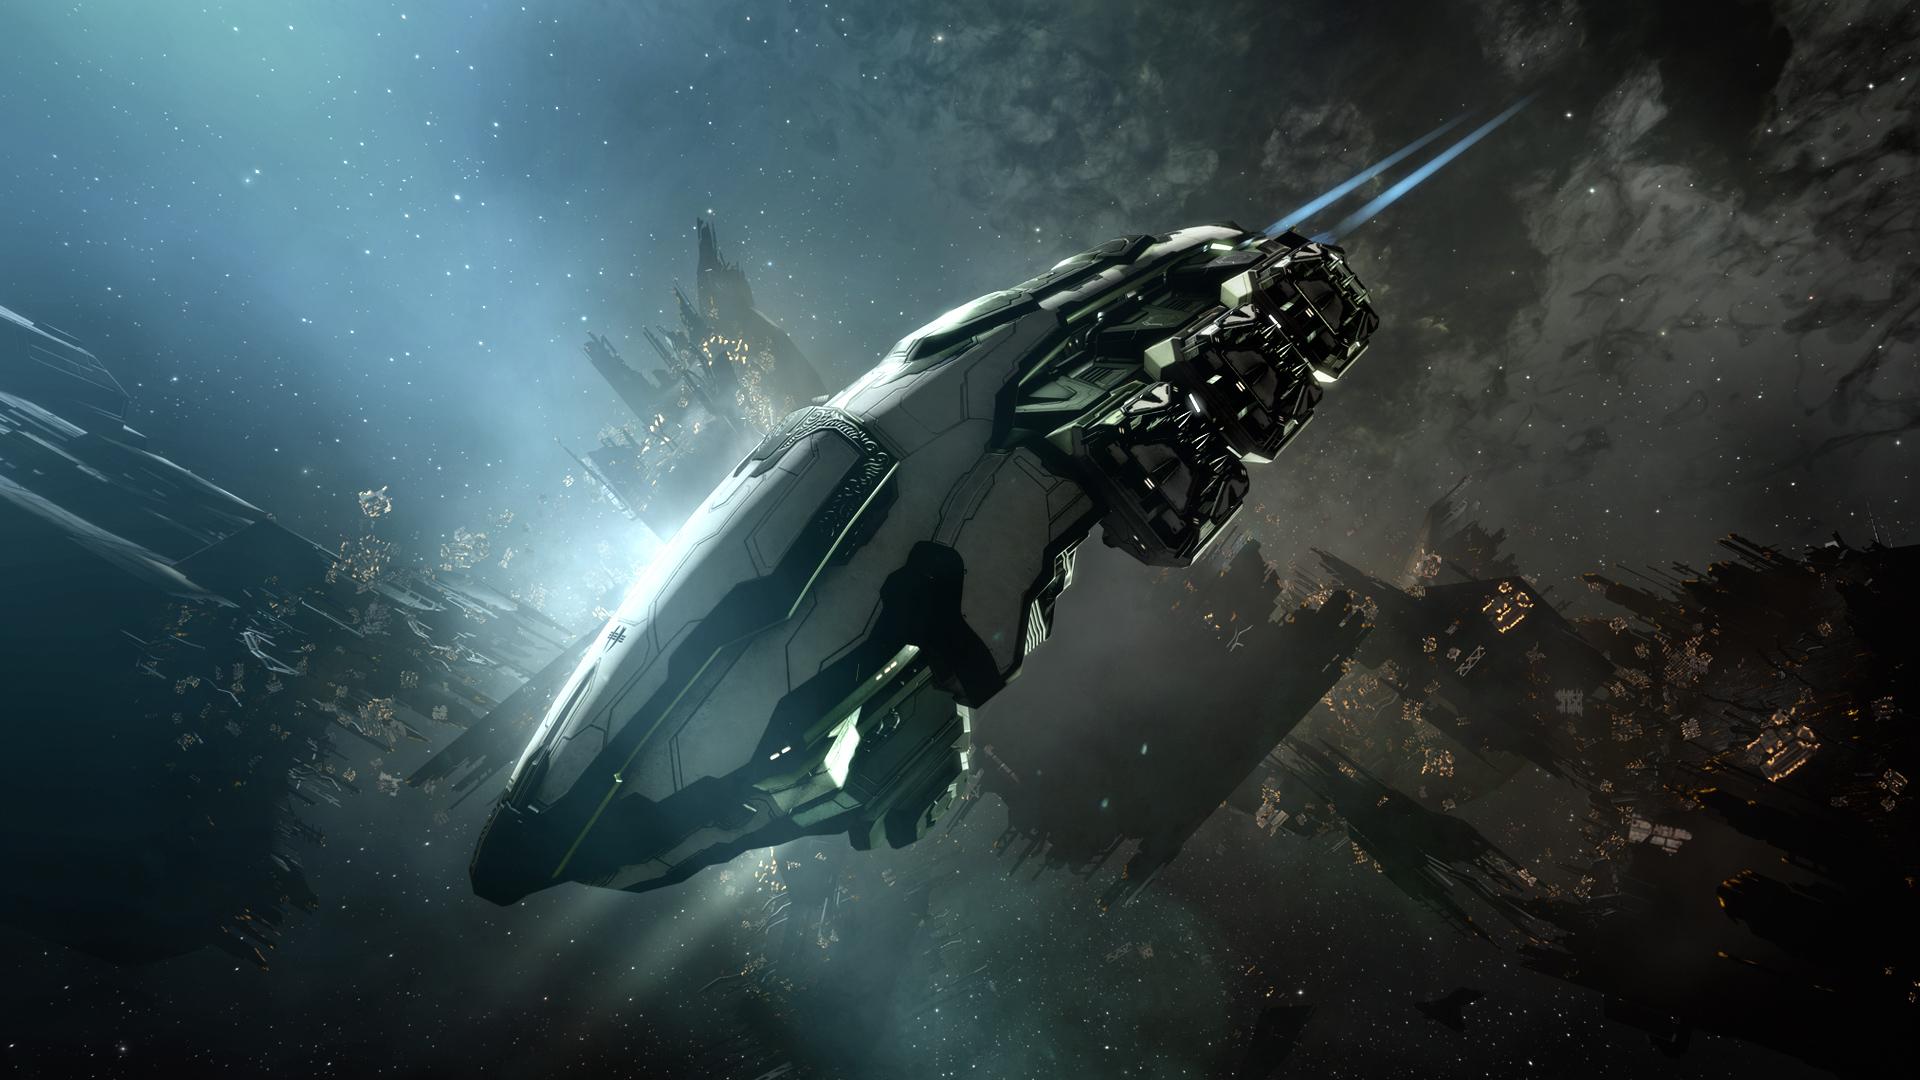 Eve online massive attack level 4 sansha